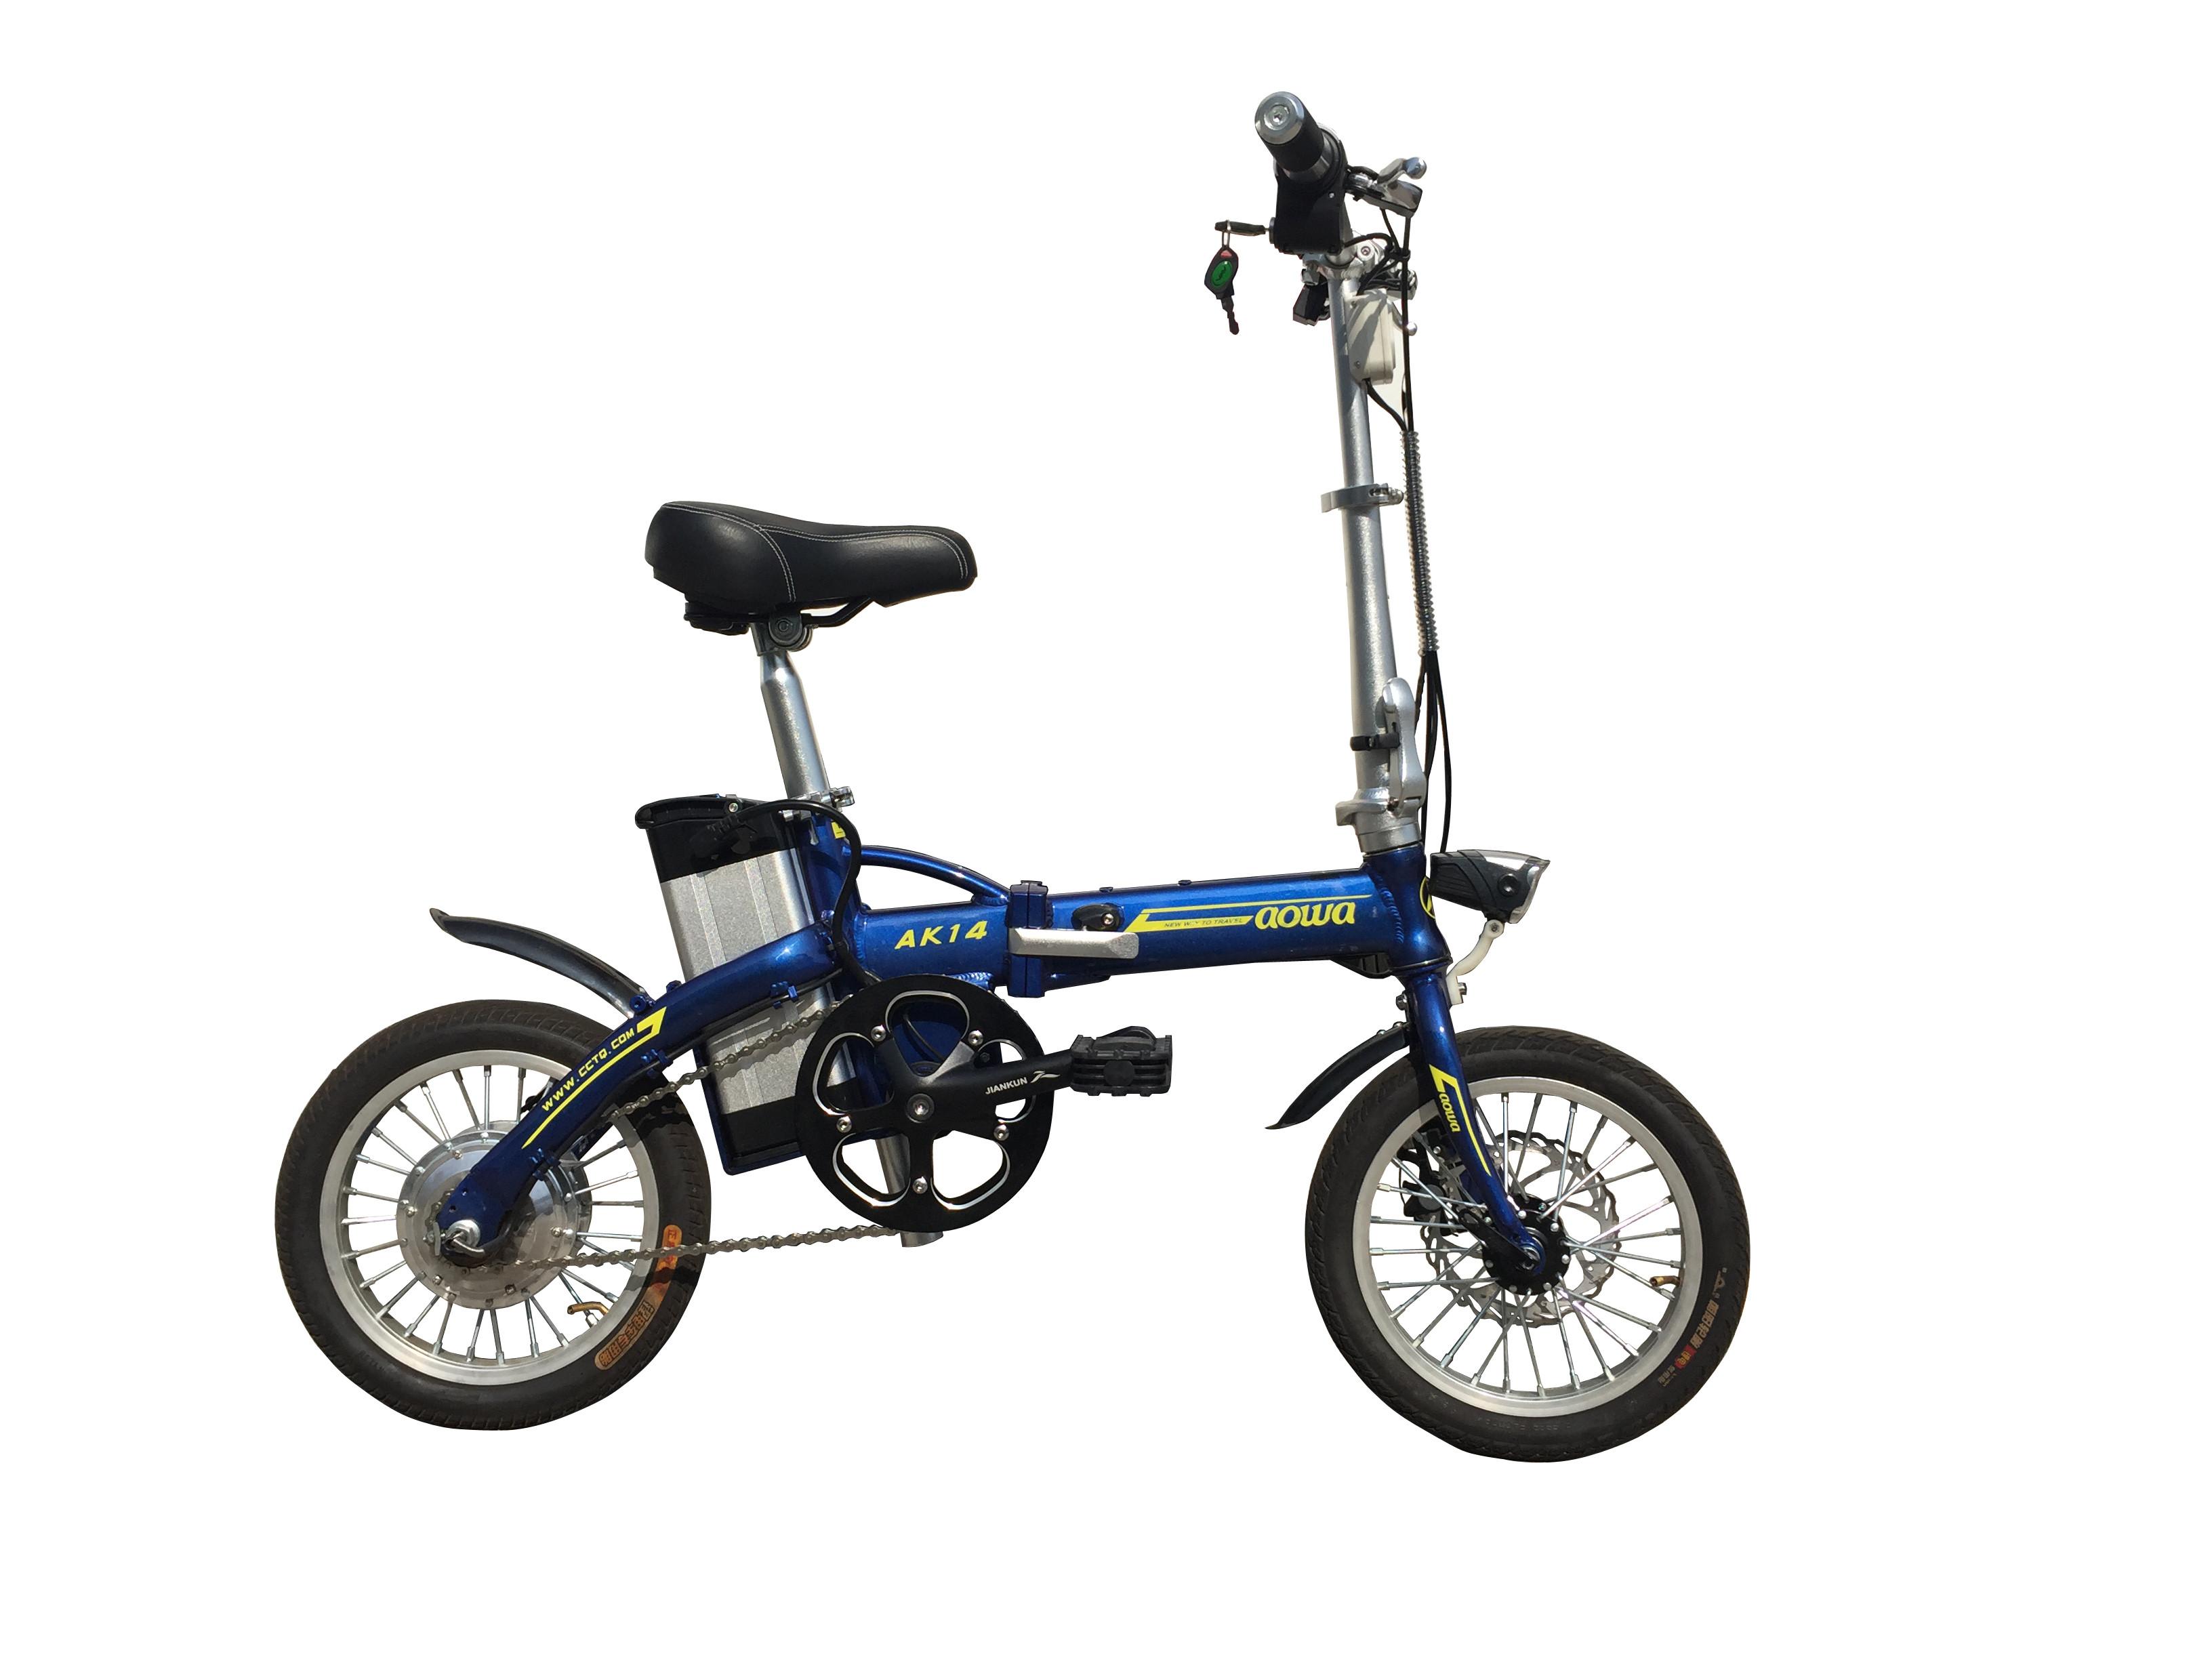 36v 8a Lightweight Folding Electric Bikes Foldaway